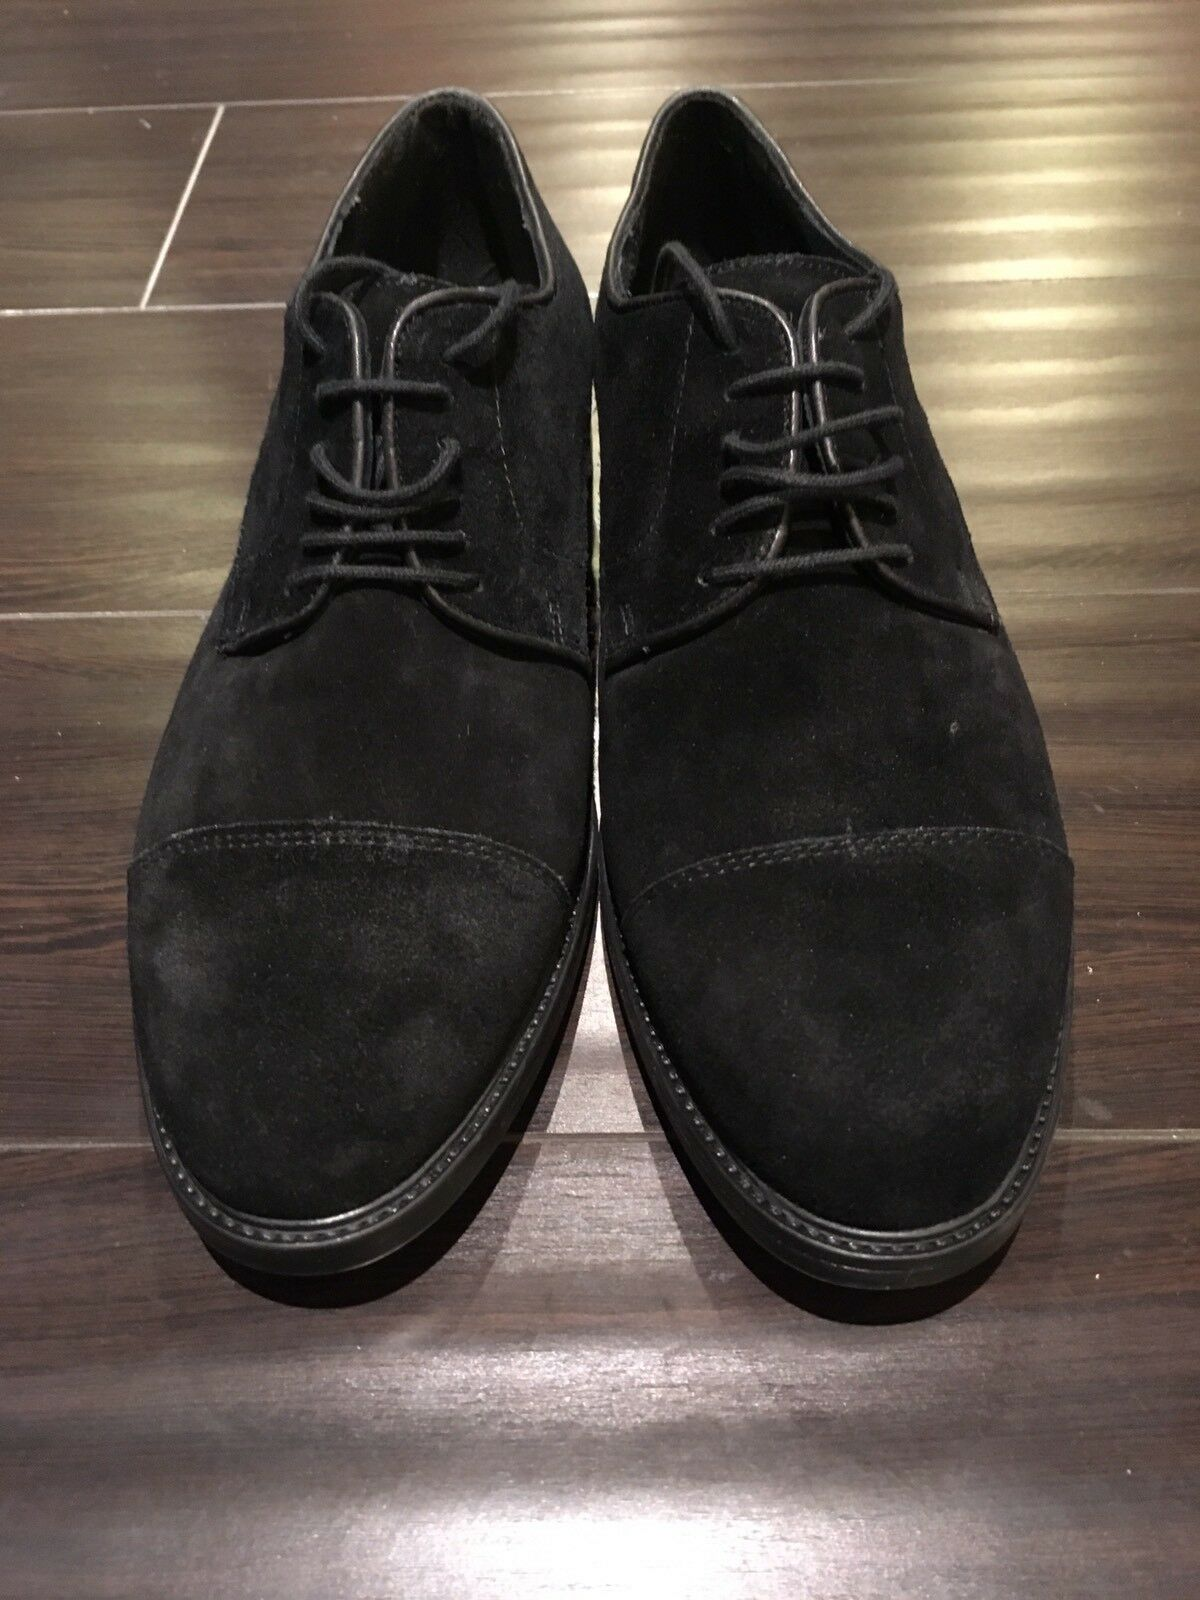 BRAND NEW ALFANI Men shoes, Black Suede leather, Size 8 US